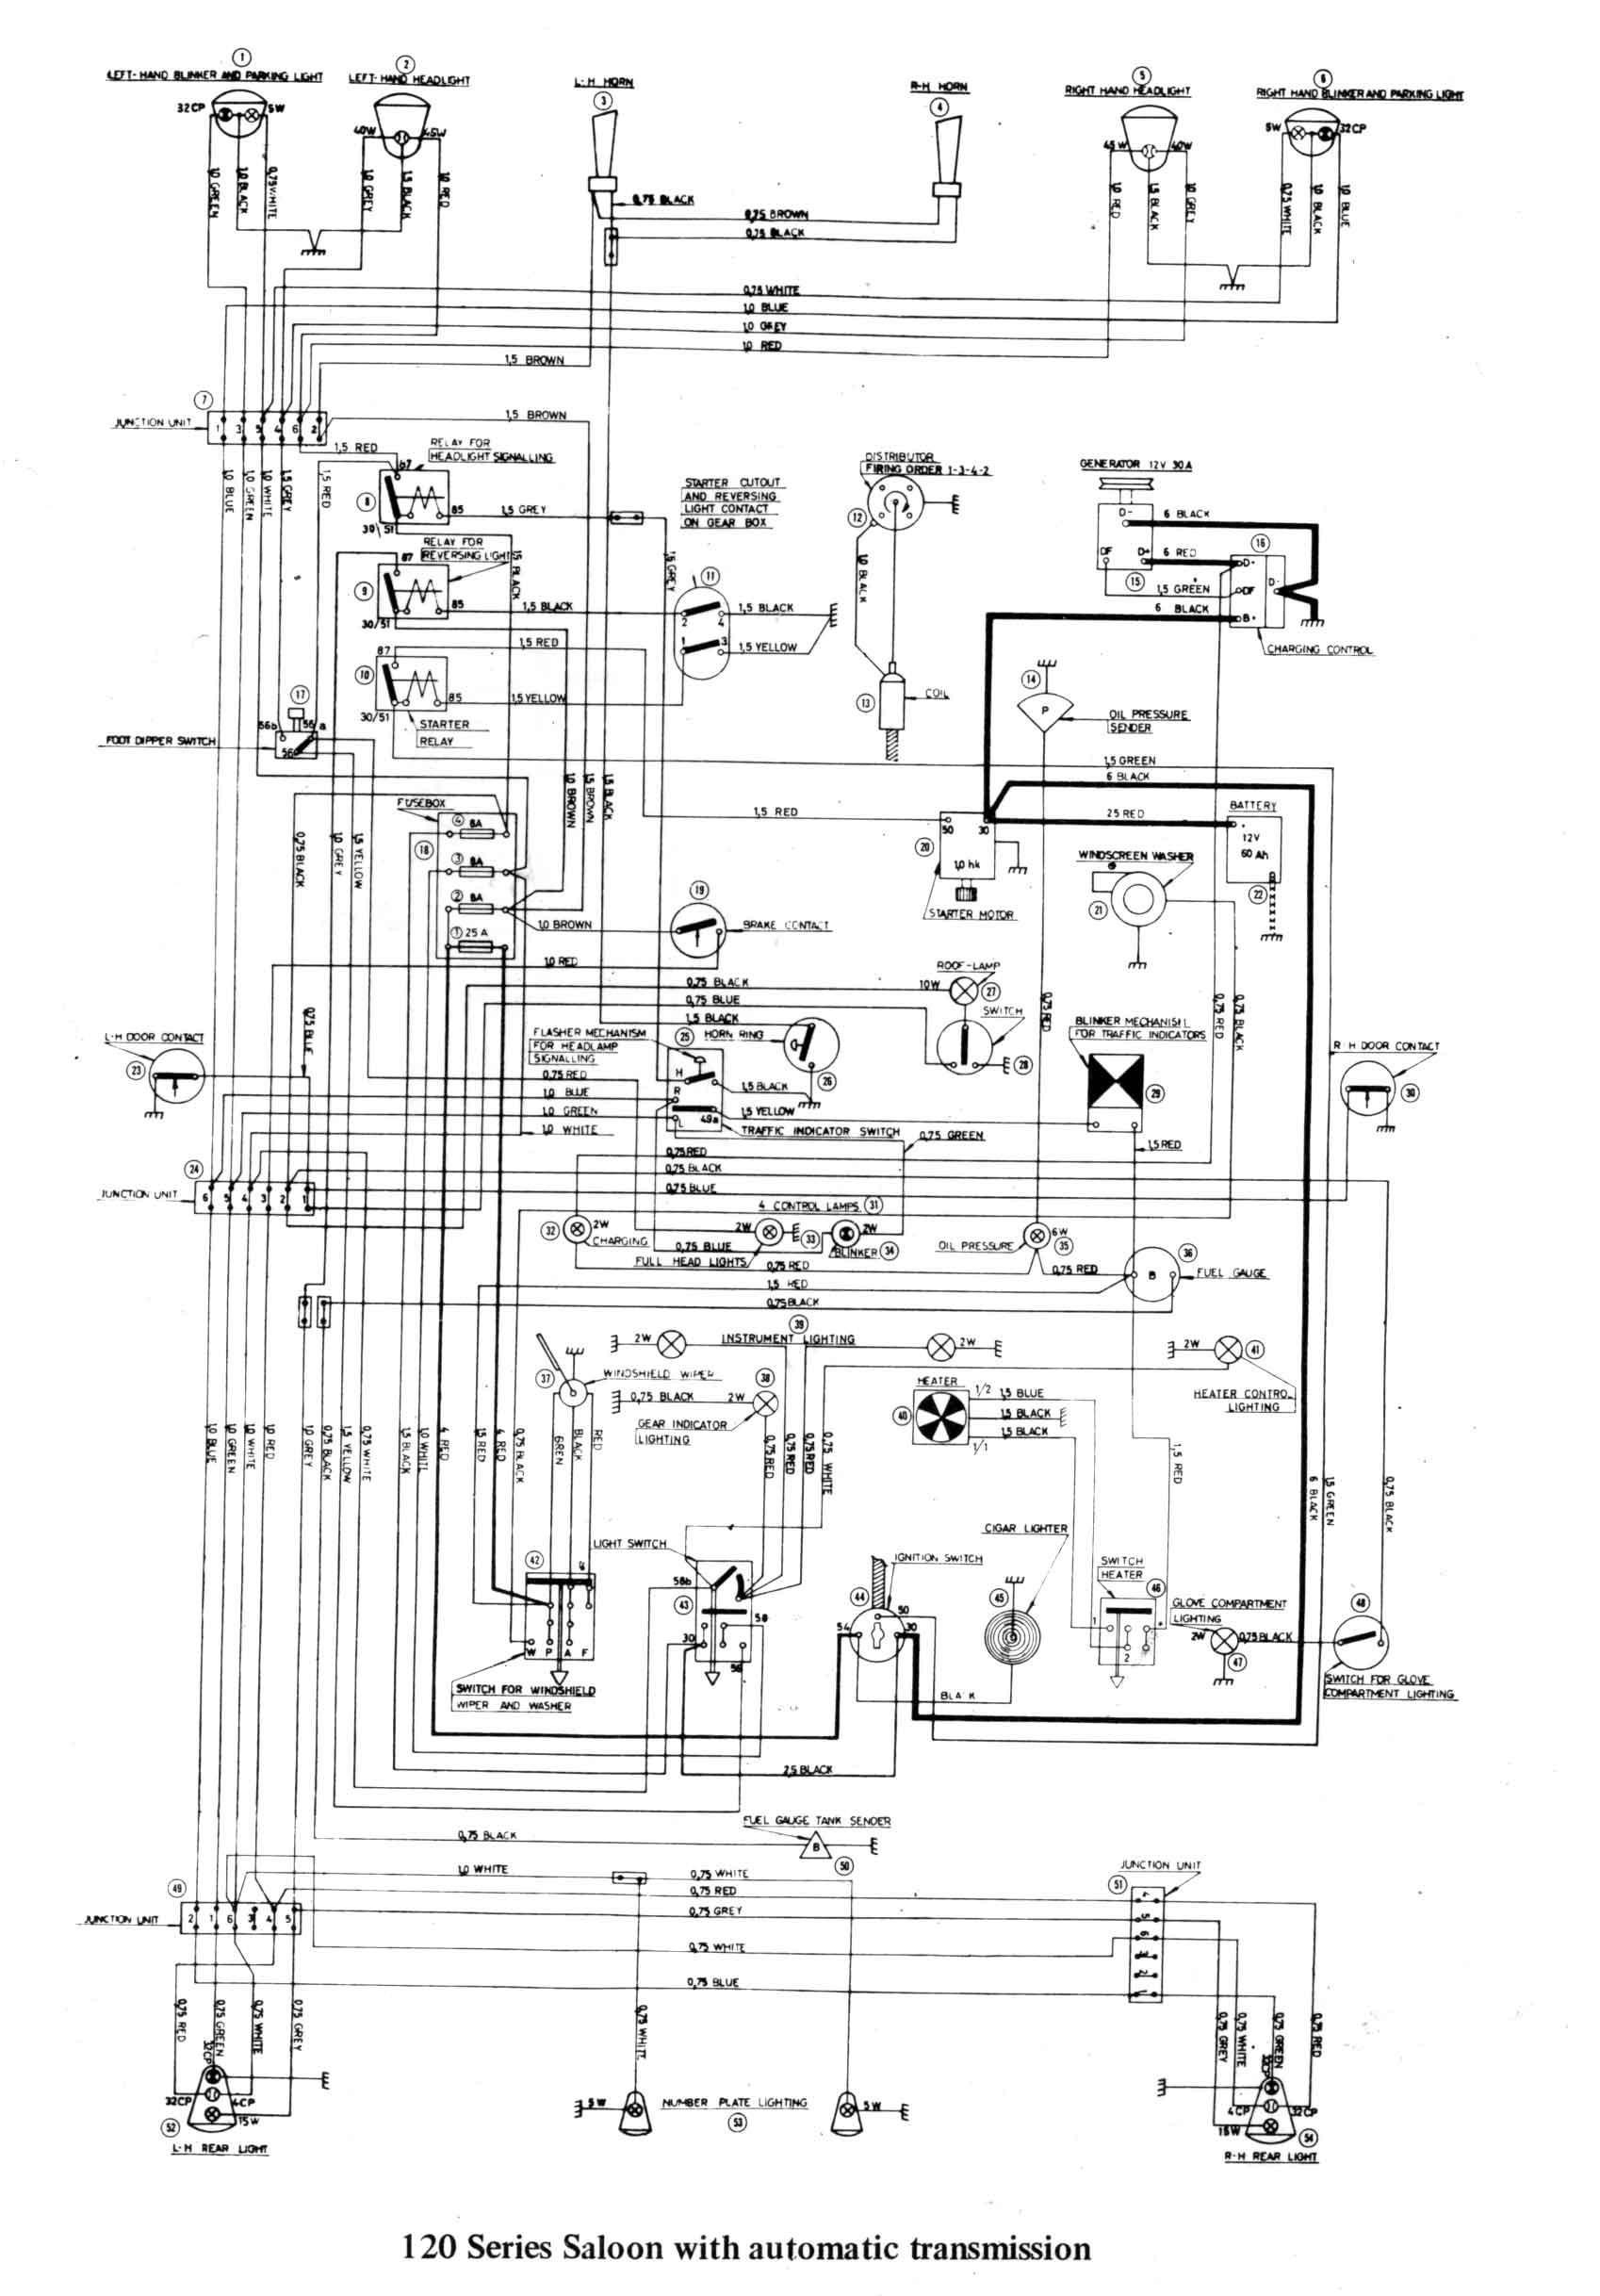 Wiring Diagrams For Yamaha Golf Carts Valid Ezgo Wiring Diagram Unique Starter Wiring Diagram Elegant Sw Em Od